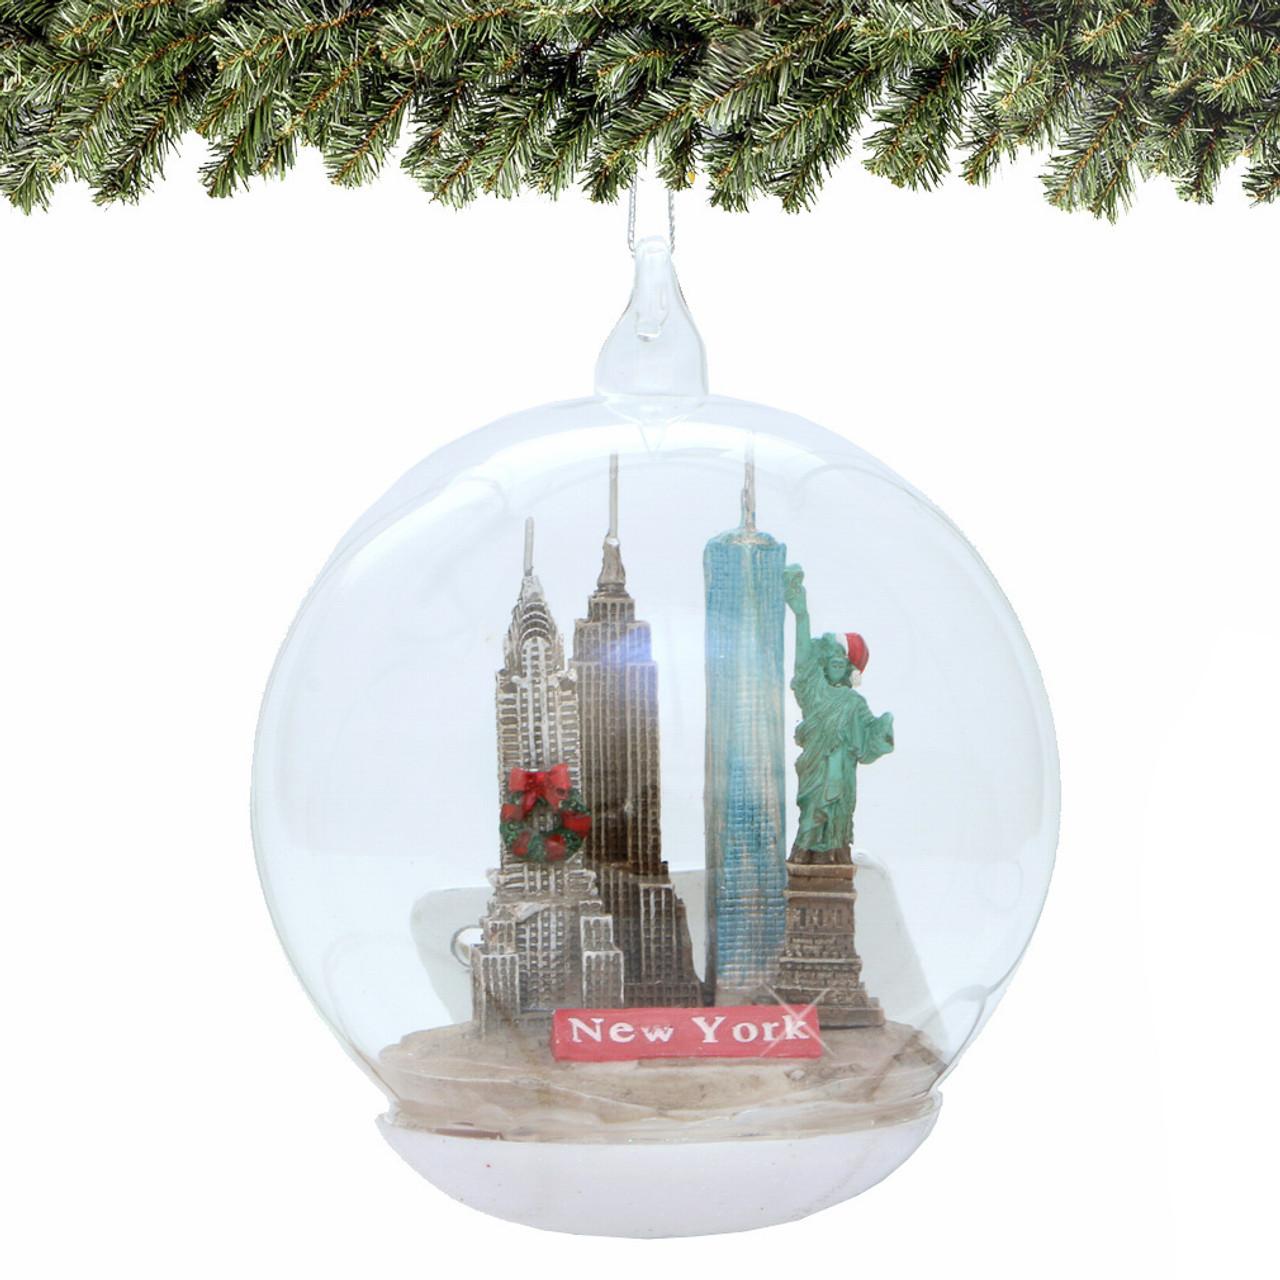 New York City Glass Christmas Ornament, Landmarks Memory Globe